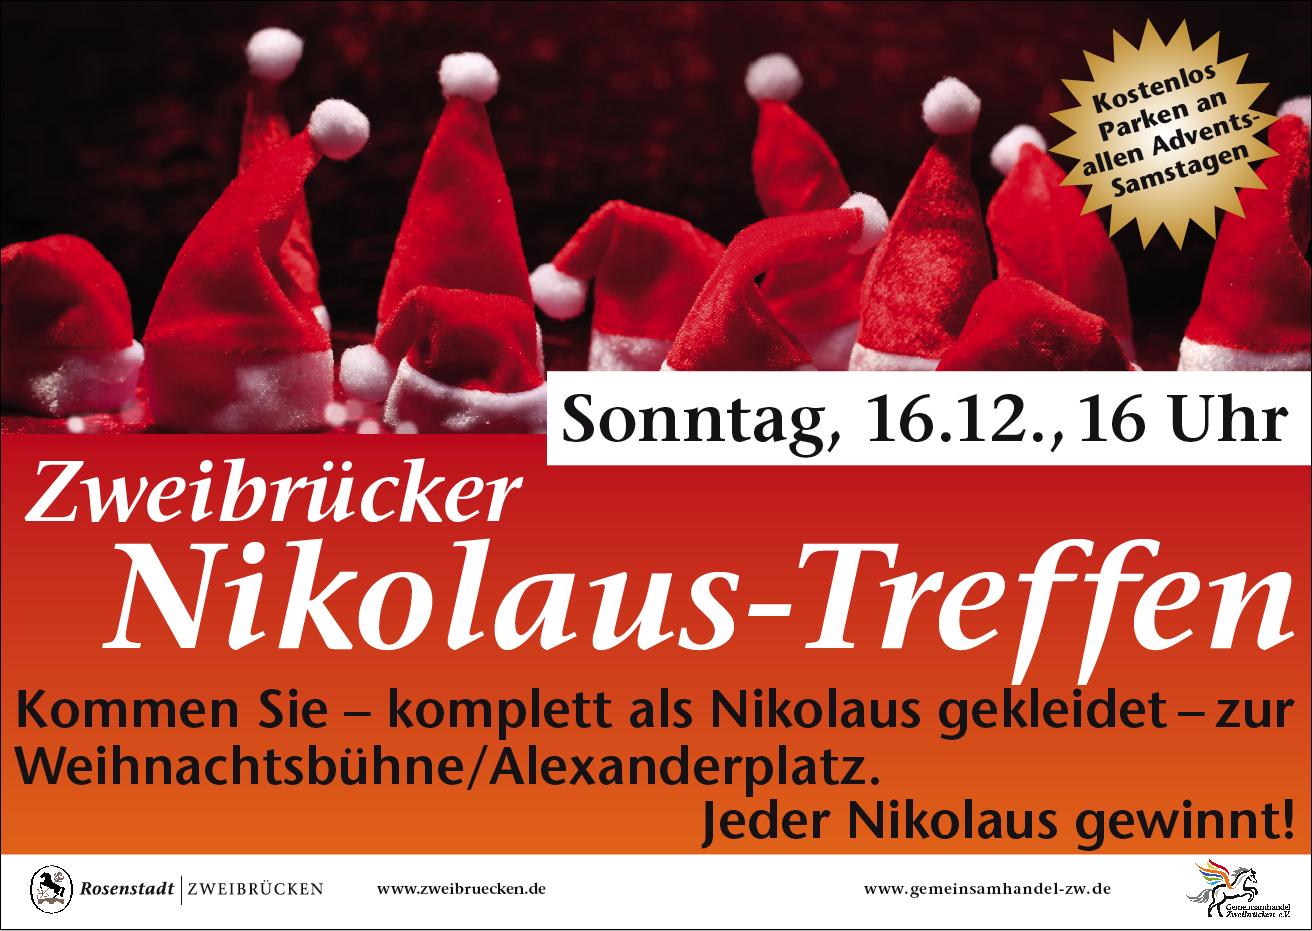 Großes Zweibrücker Nikolaustreffen - Gemeinsam handeln